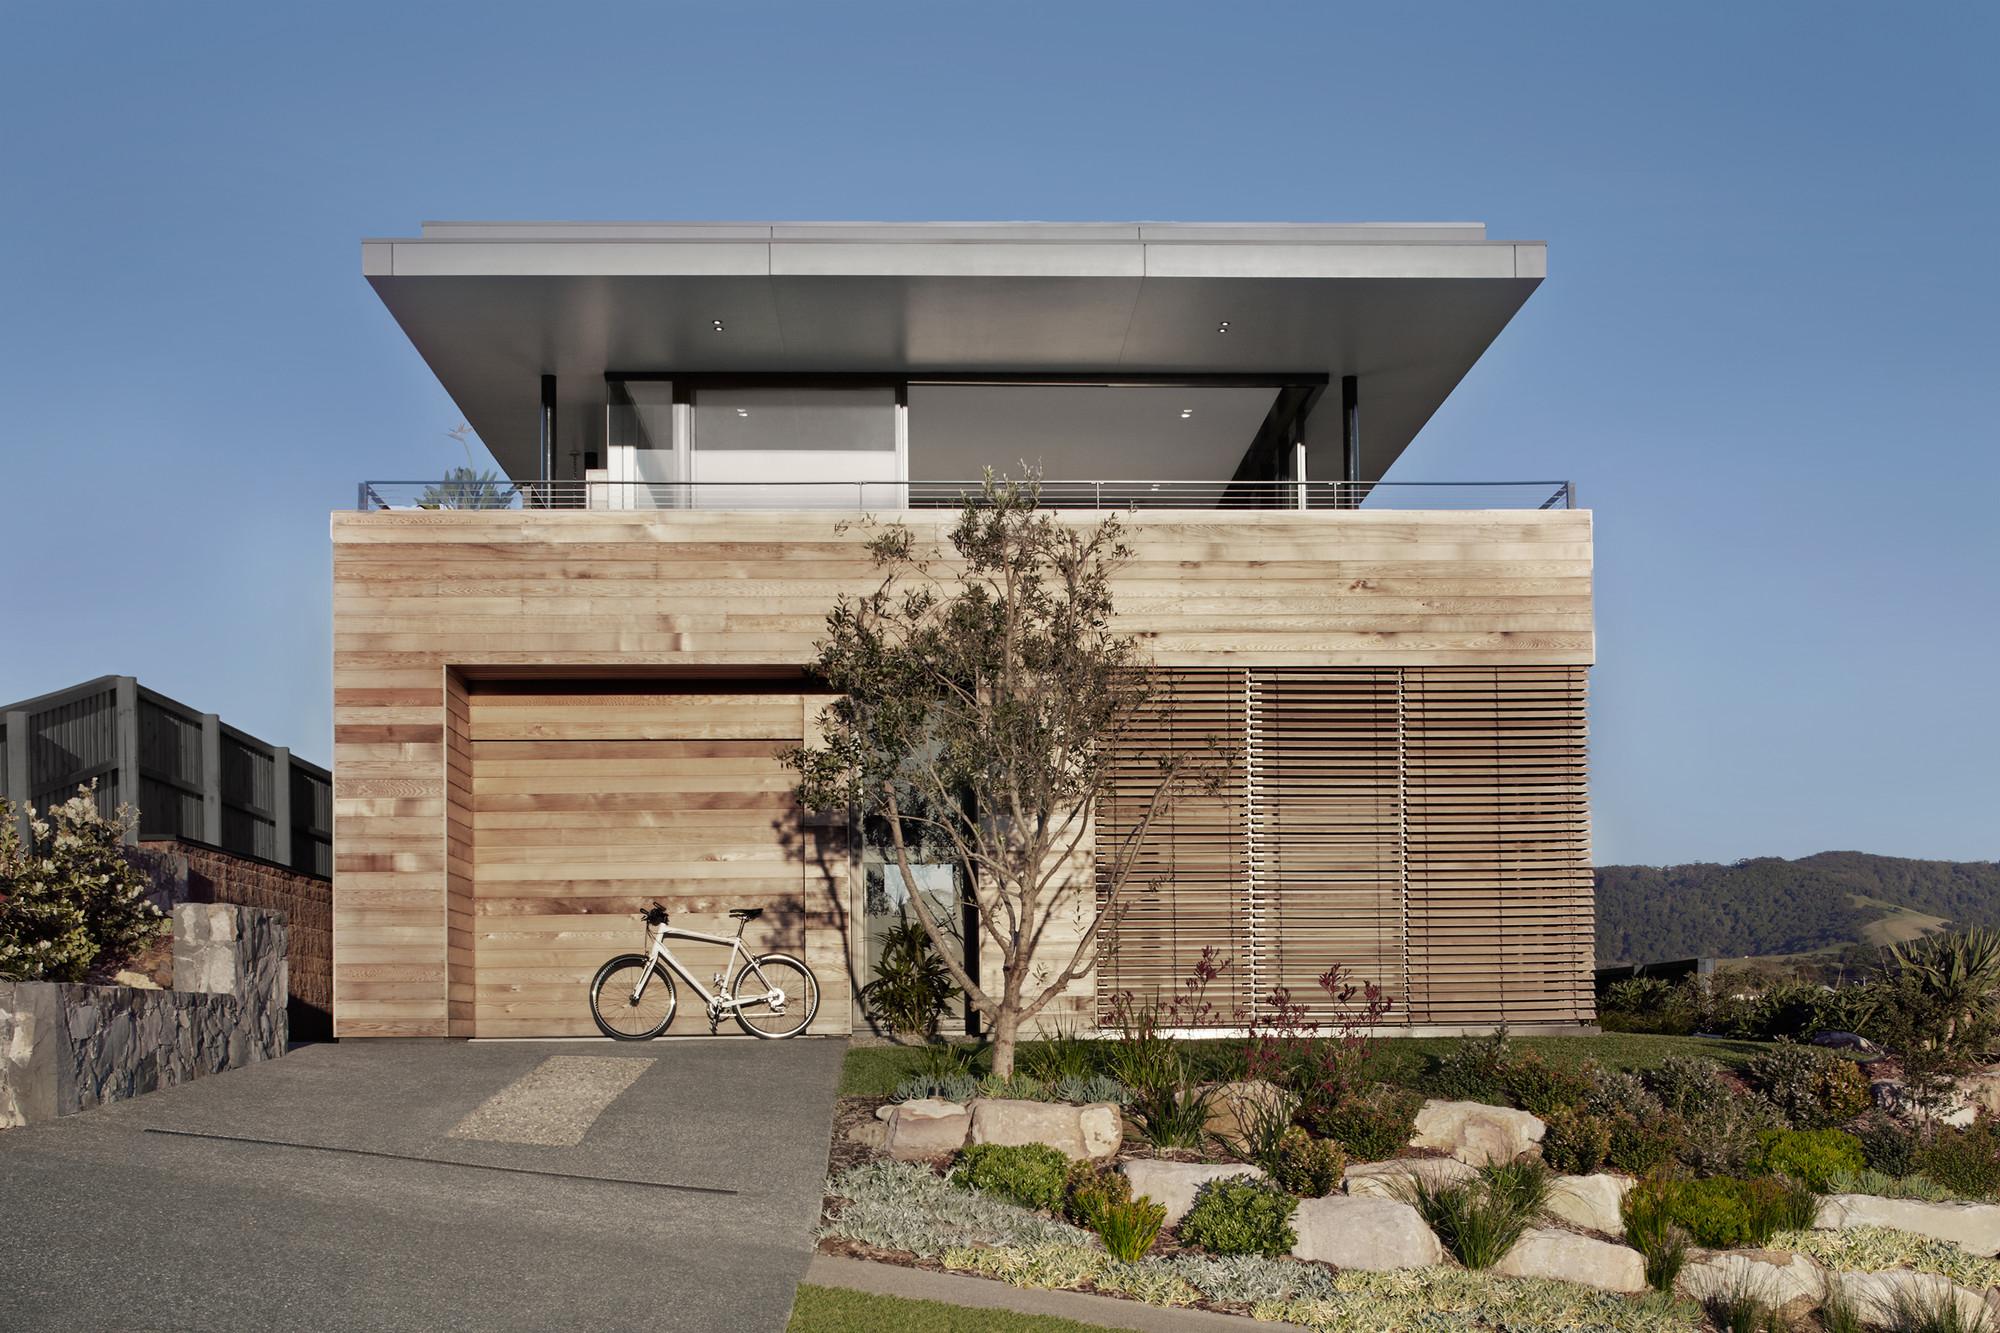 architectural design studio 1. Lamble Residence  Smart Design Studio 1 19 Gallery of